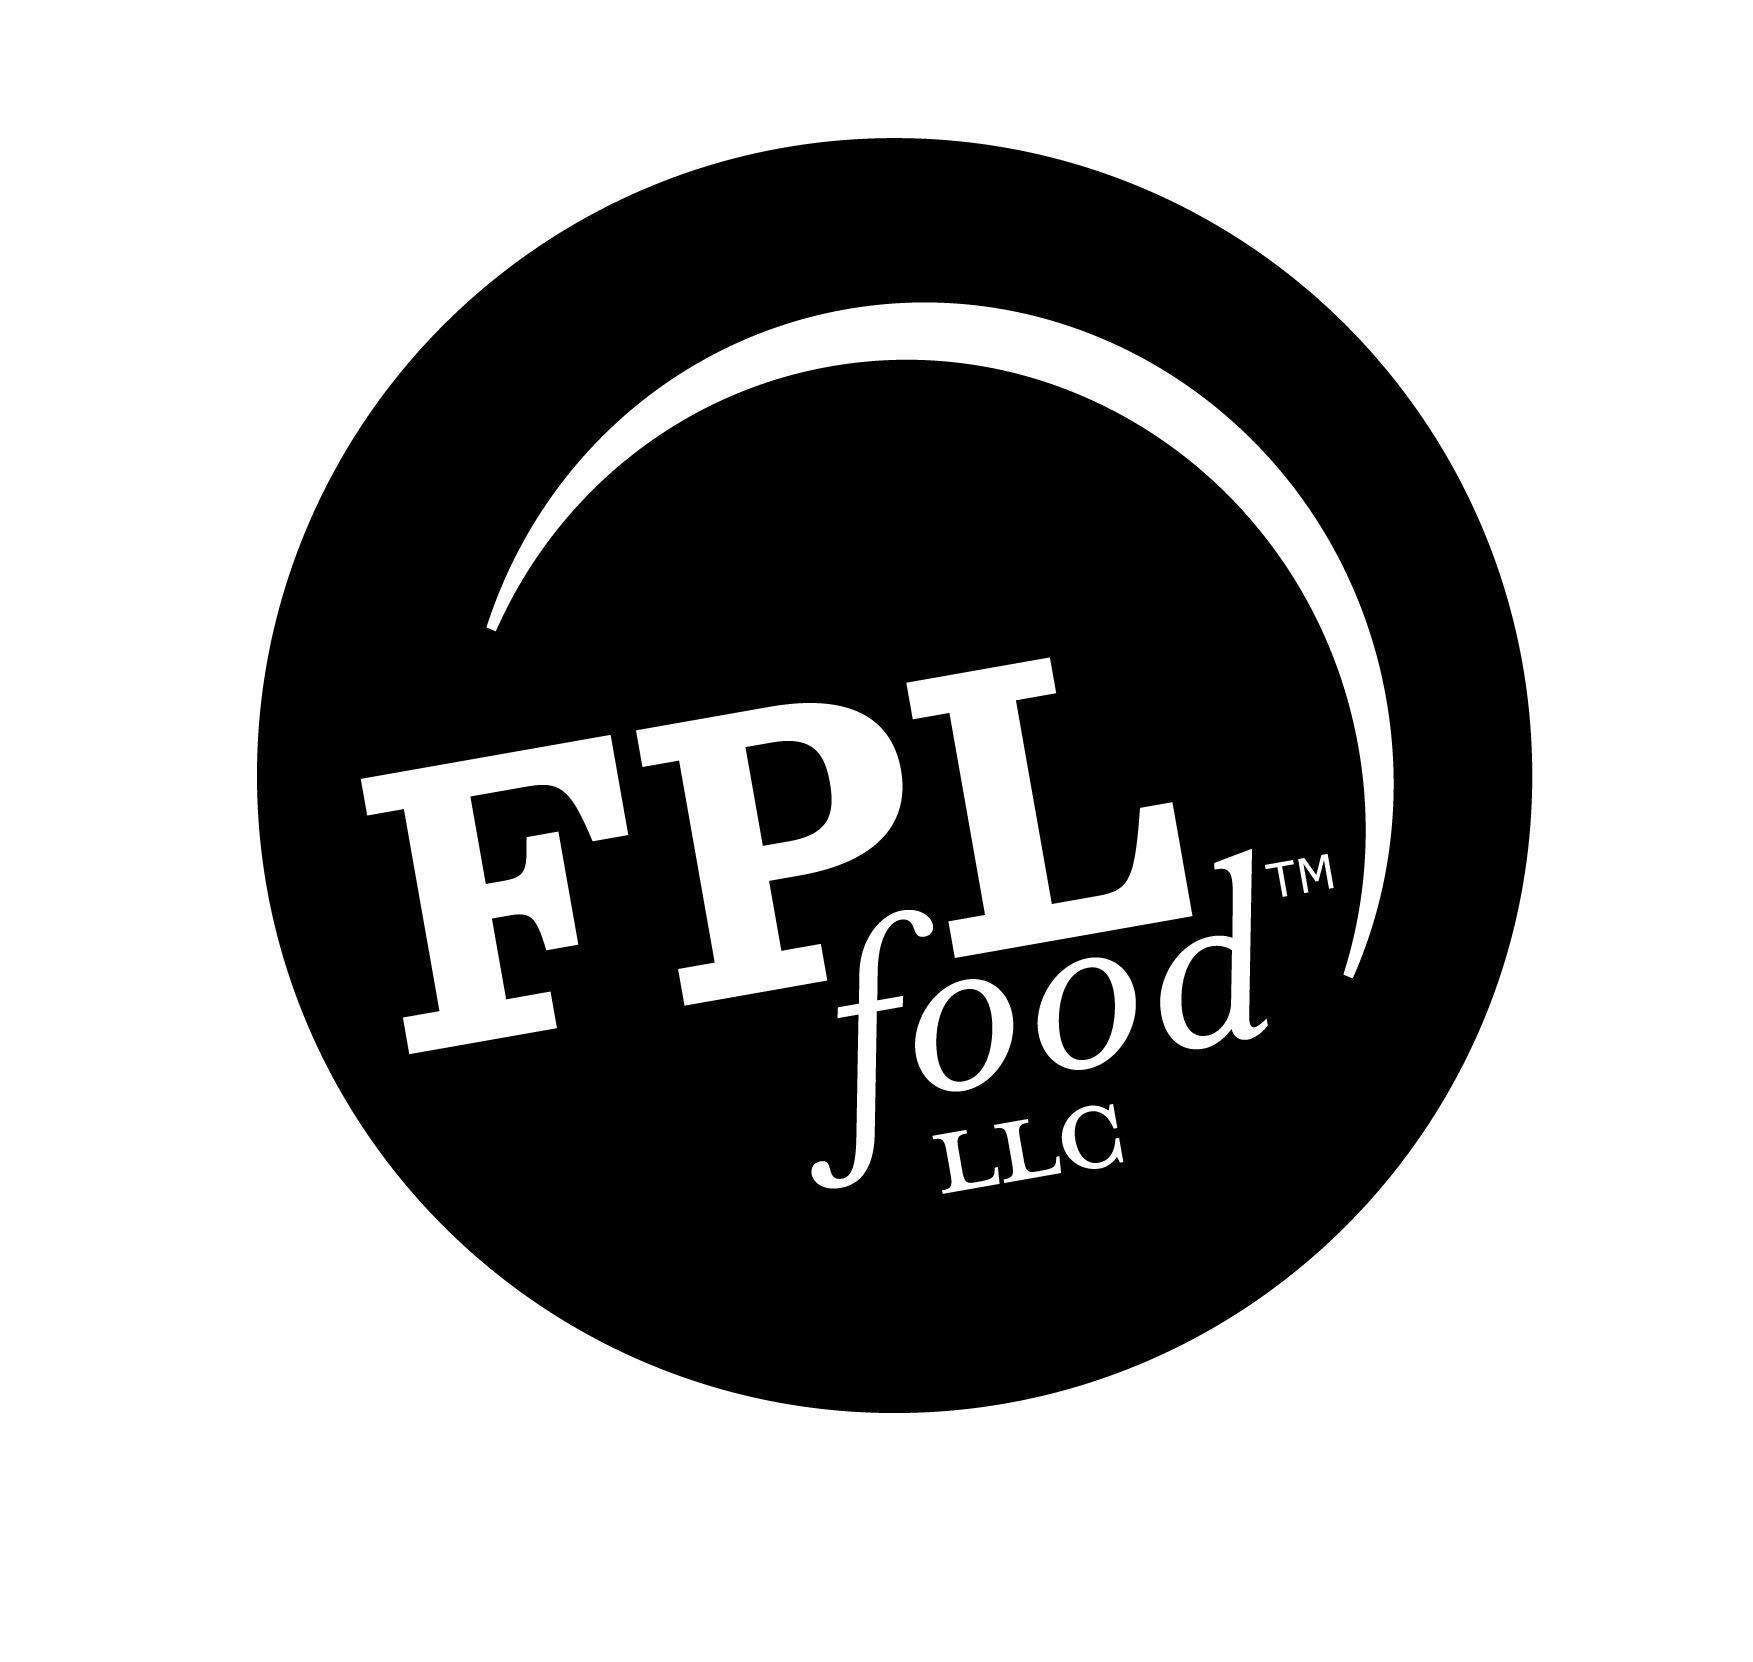 Quality Beef Producers In Georgia Fpl Food Llc